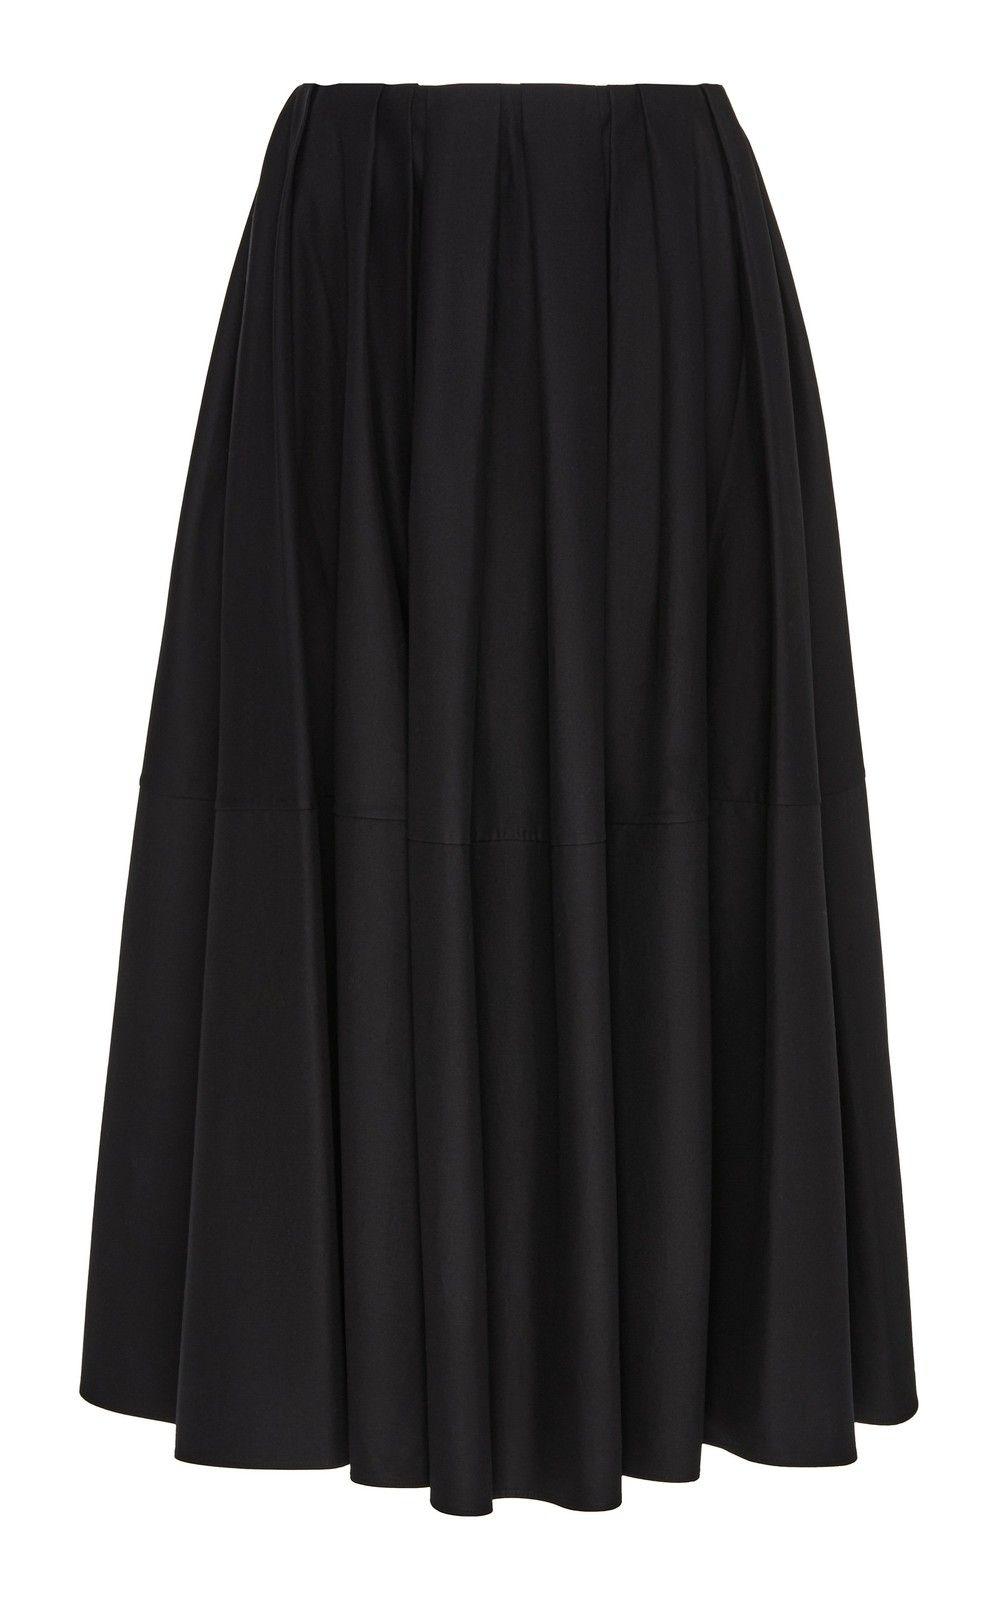 Belted Pleated Cotton Gabardine Midi Skirt By Martin Grant Moda Operandi In 2020 Jacquard Midi Skirt Cotton Skirt Midi Skirt